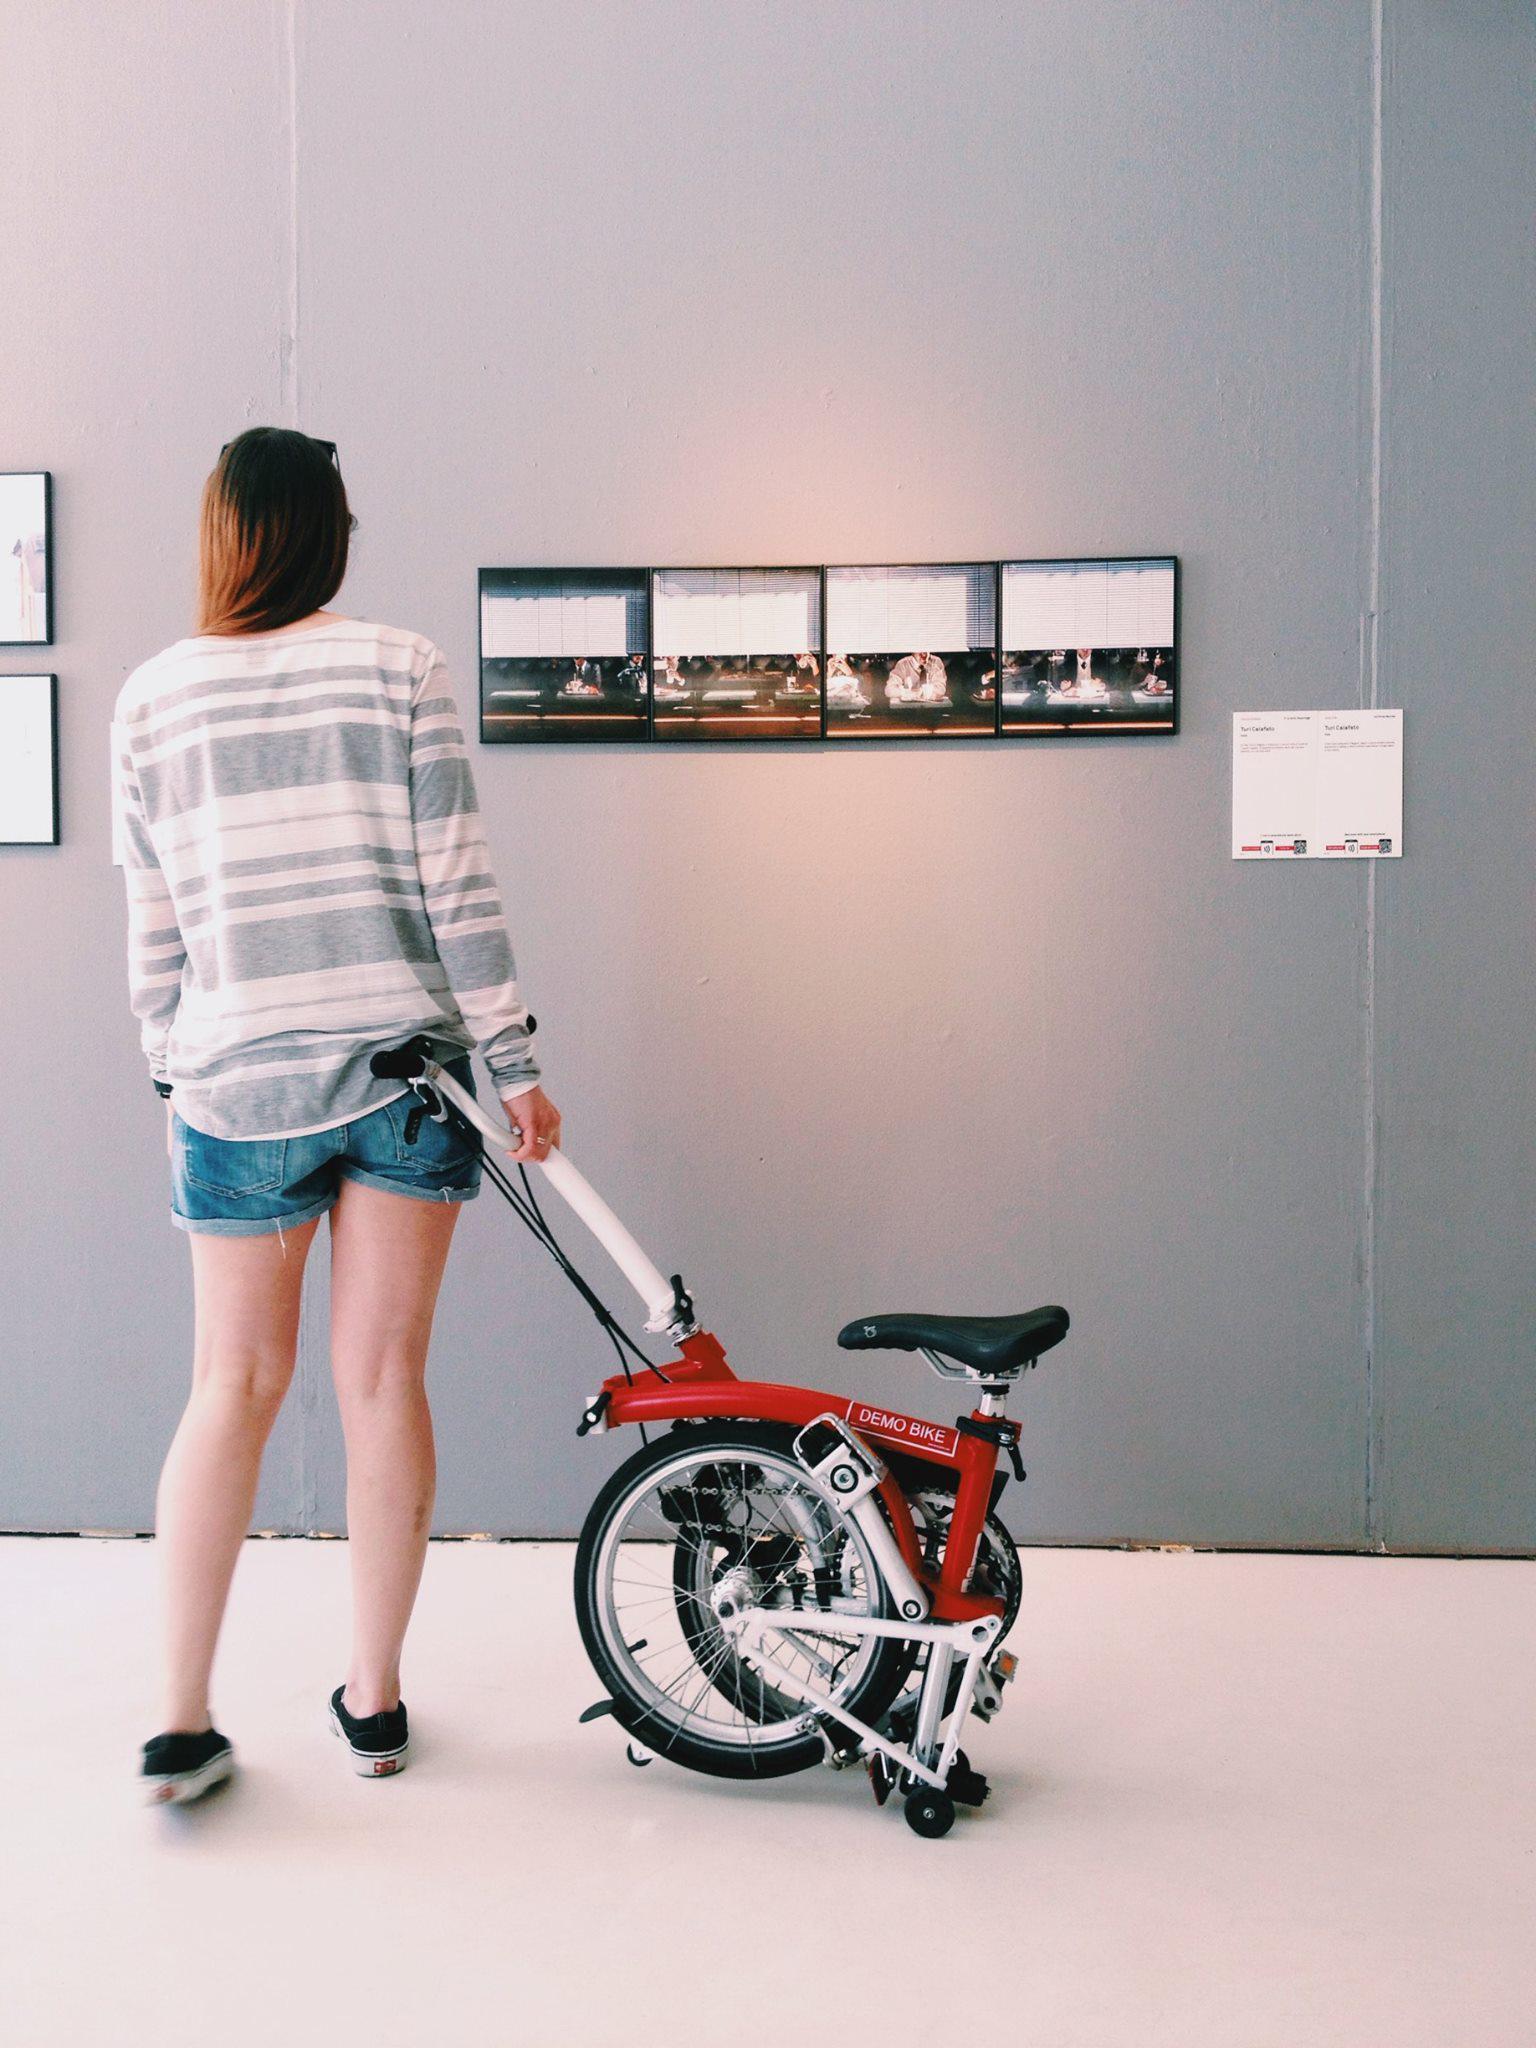 RT @BromptonJMilano: Giulia visits #worldpressphoto #galleriasozzani #carlasozzani #mybrompton #brompton #bromptonbicycle @10CorsoComo http…